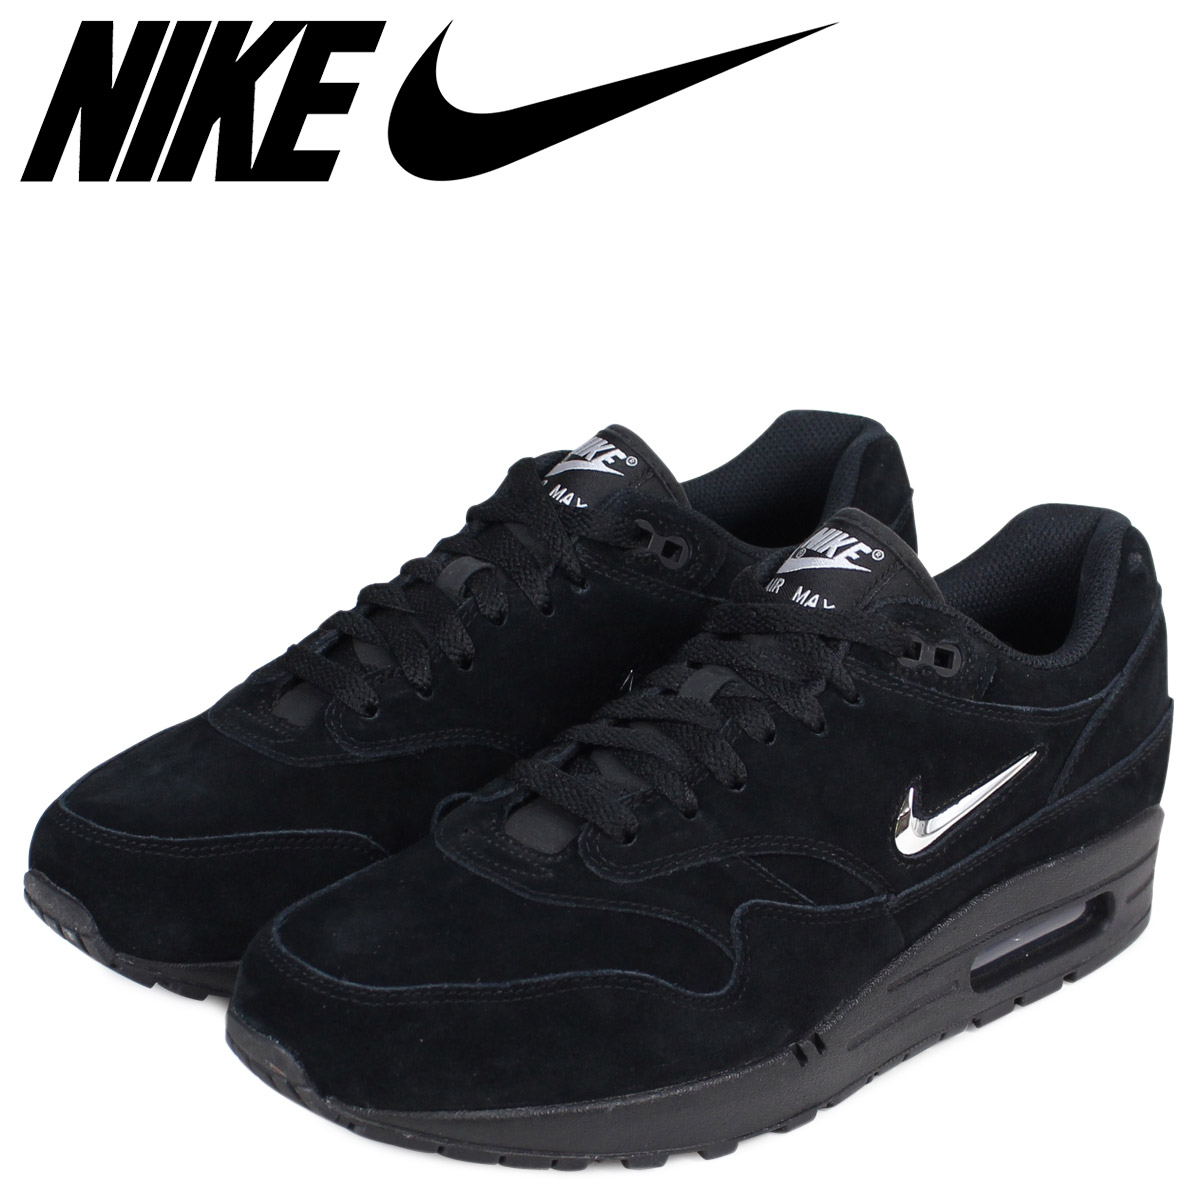 NIKE Kie Ney AMAX 1 premium sneakers AIR MAX 1 PREMIUM SC 918,354 005 men's shoes black black